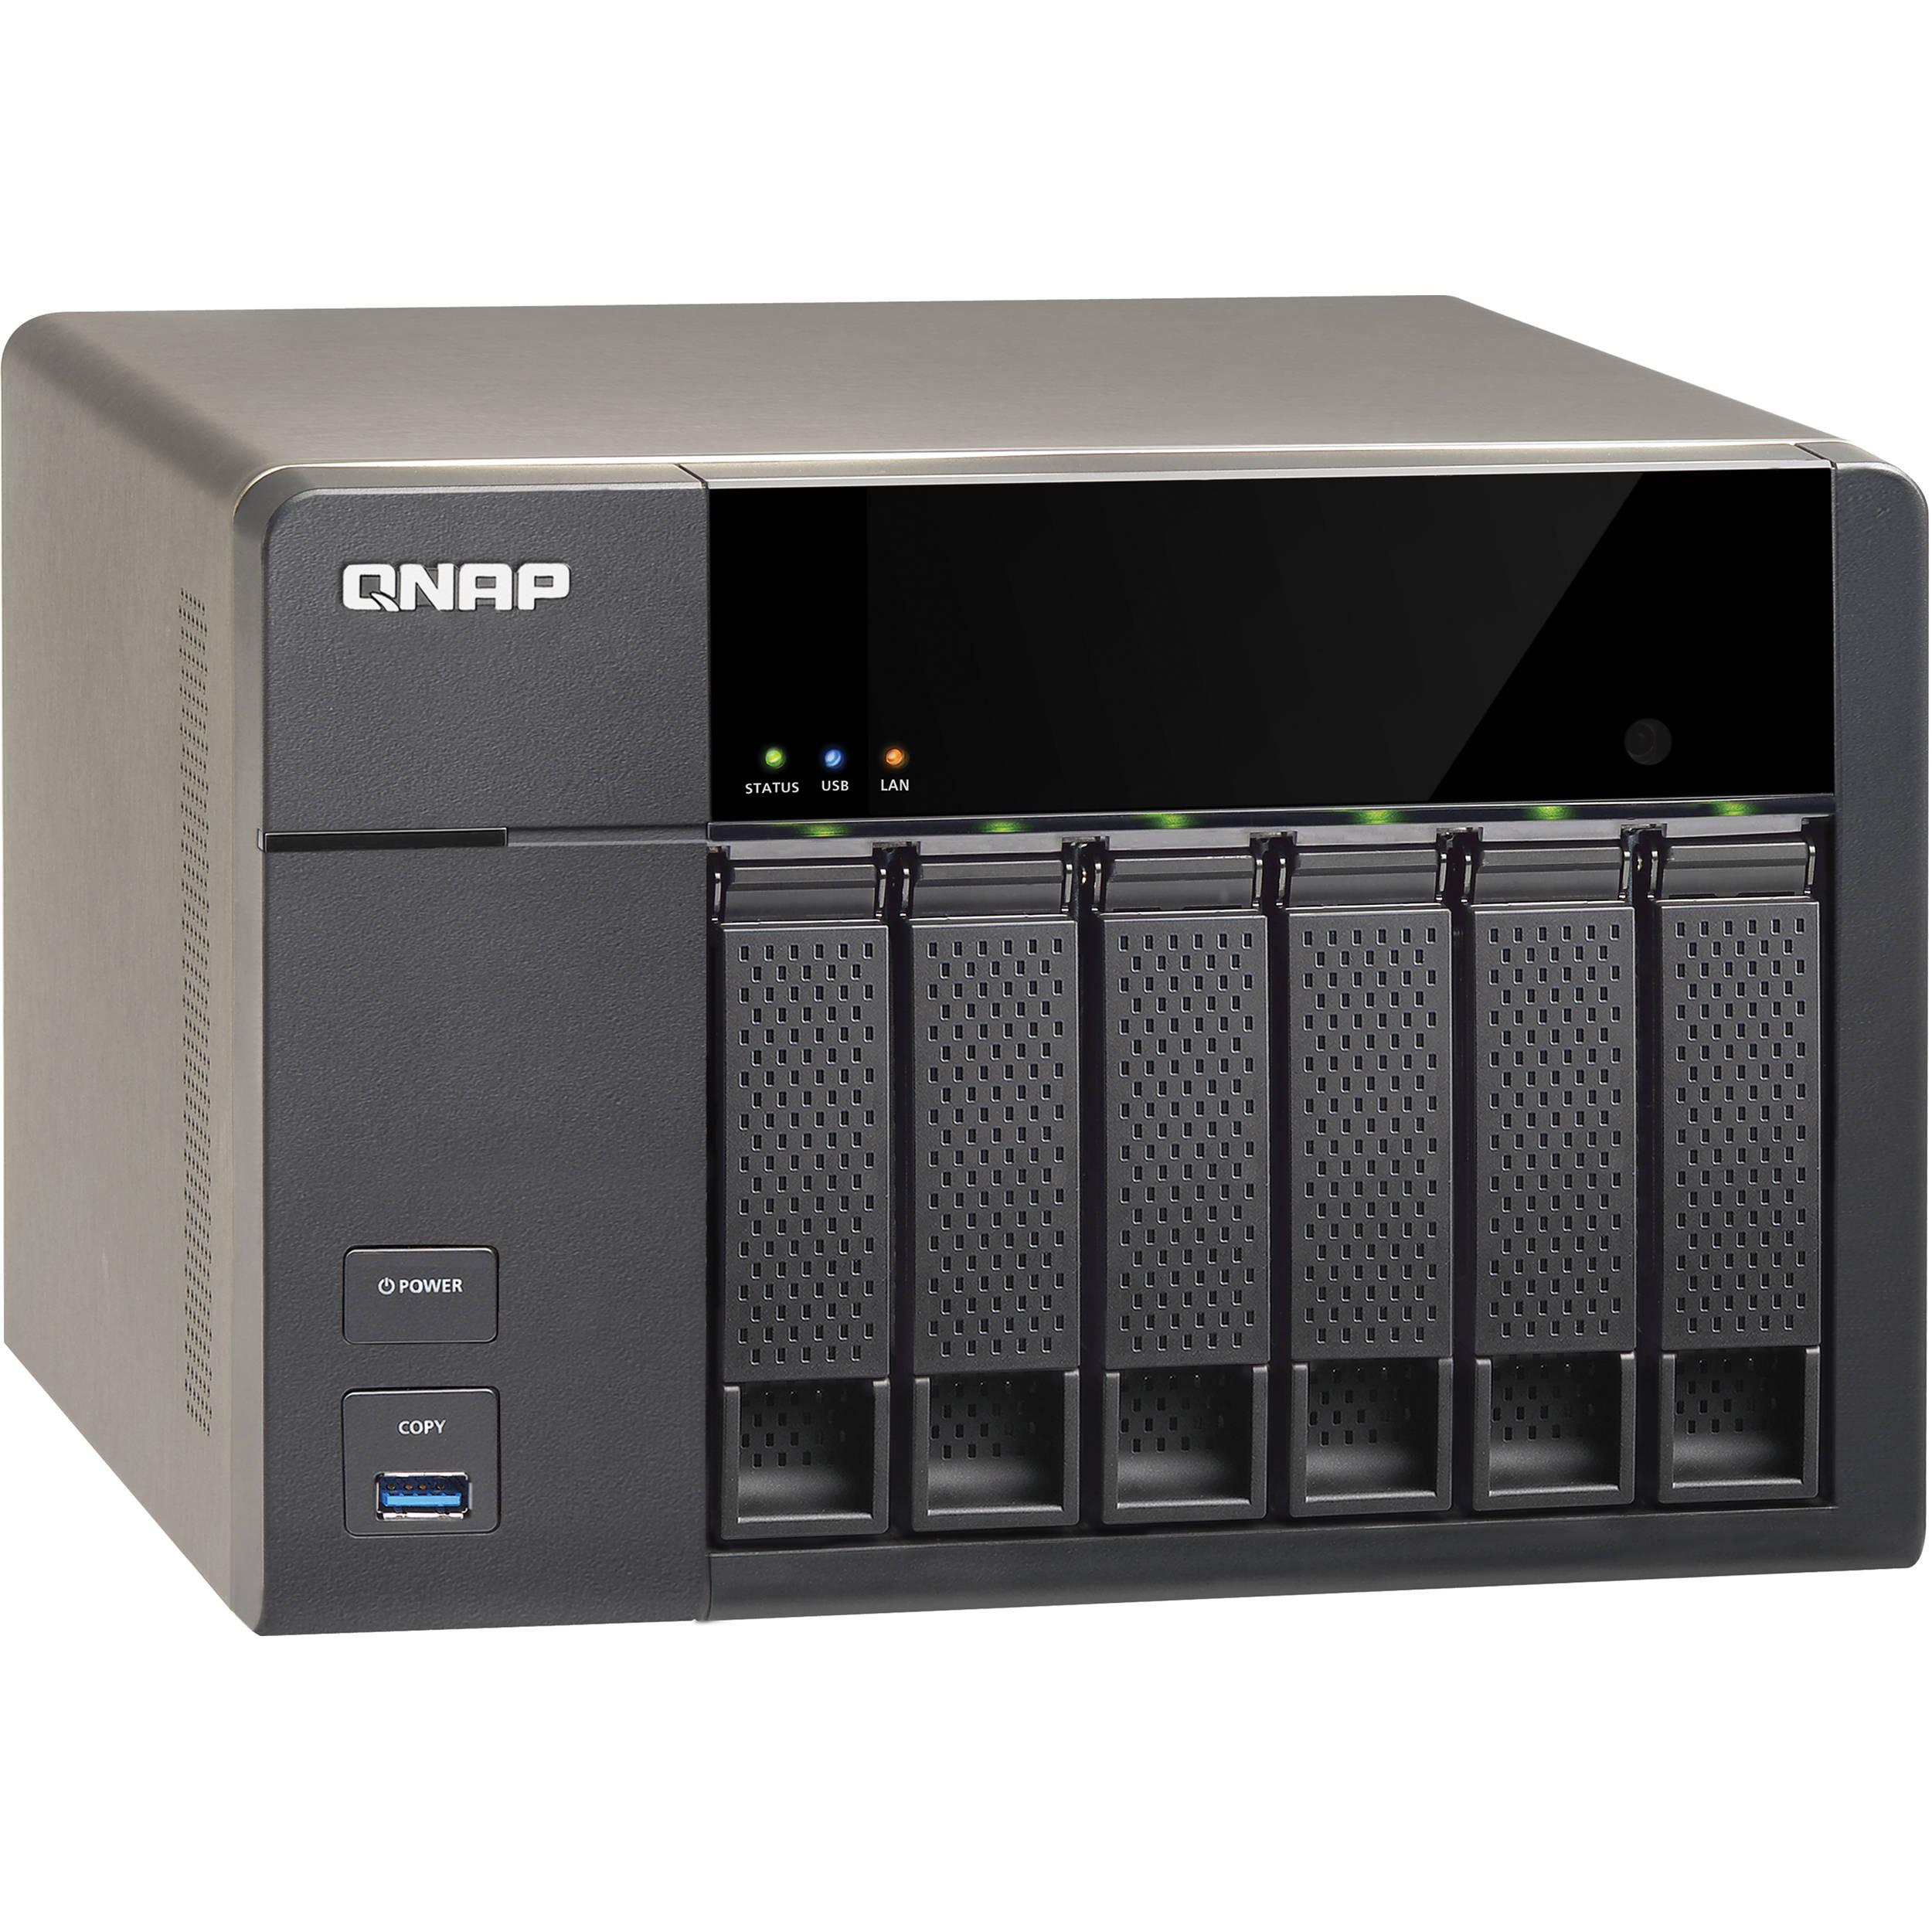 QNAP TS-651 6-Bay Home and SOHO NAS Server